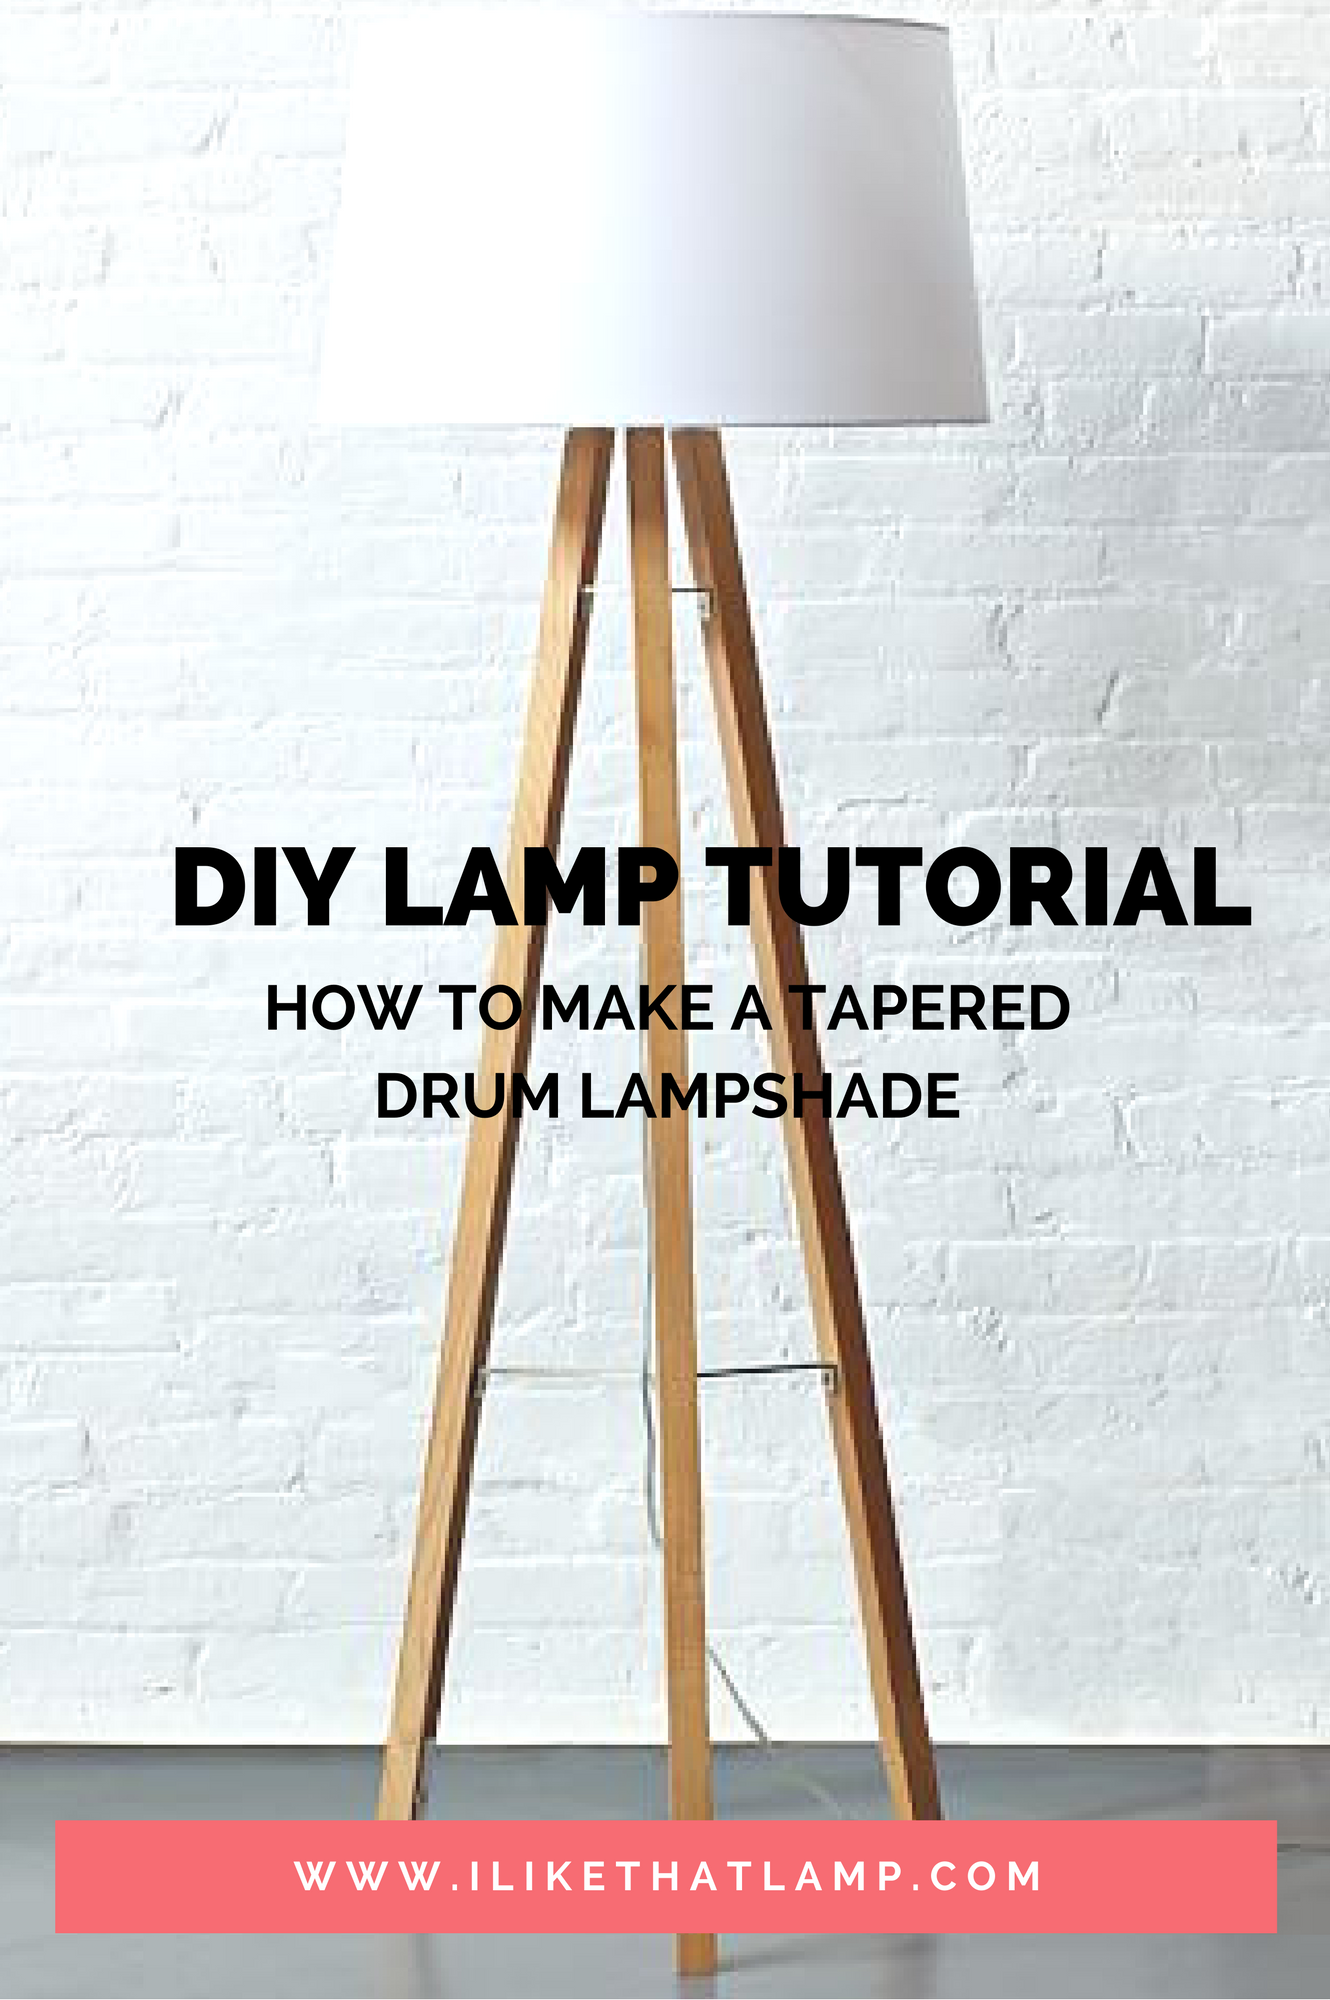 How To Make A Diy Tapered Drum Lampshade For A Table Floor Tripod Ceiling Light Full Tutori Lustres Artesanais Luminarias Feitas Em Casa Luminaria De Piso